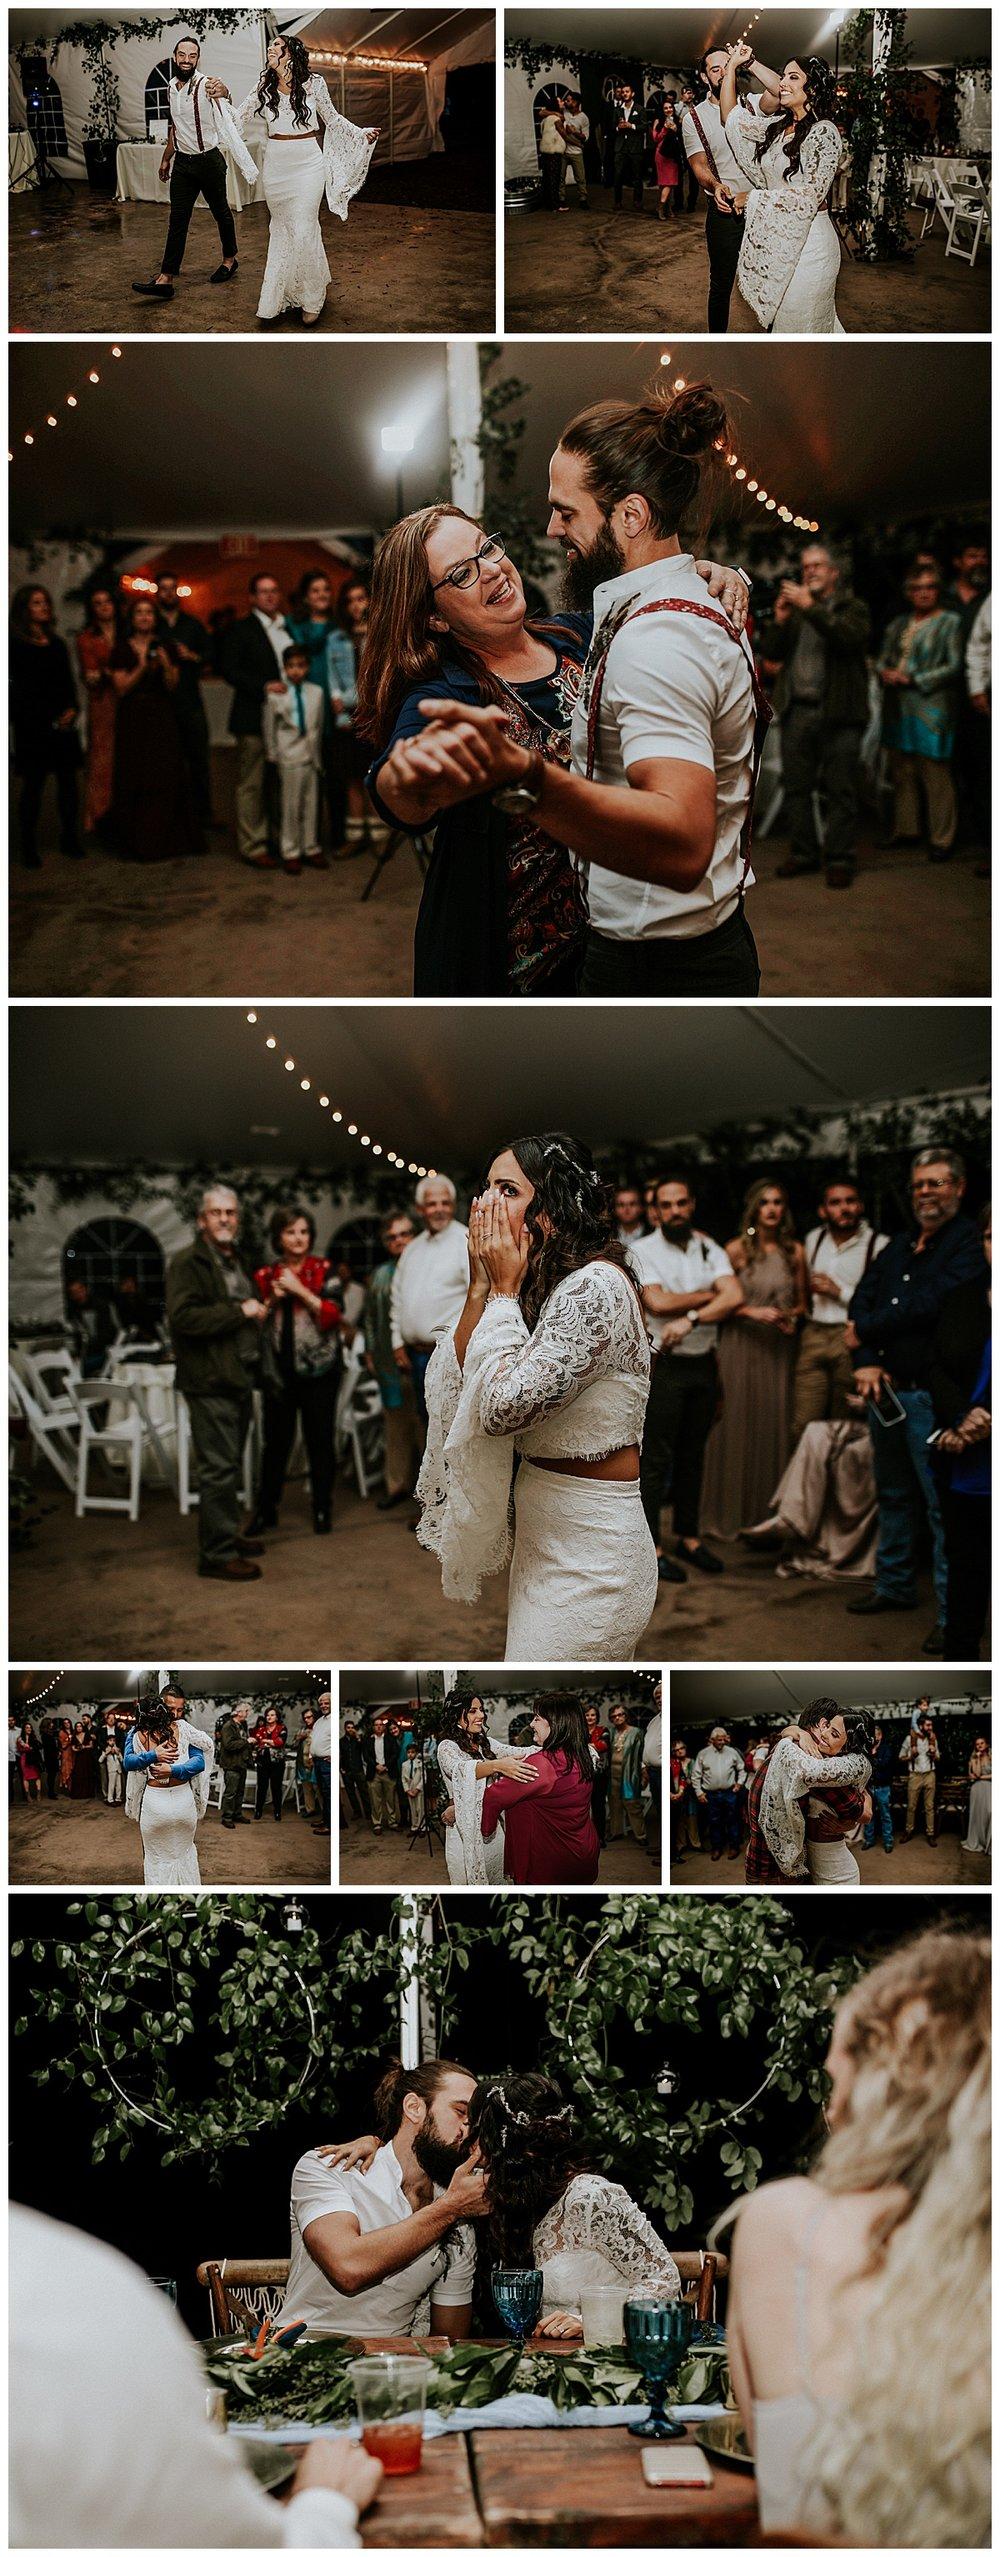 Wedding Reception Goals for Bohemian style Wedding